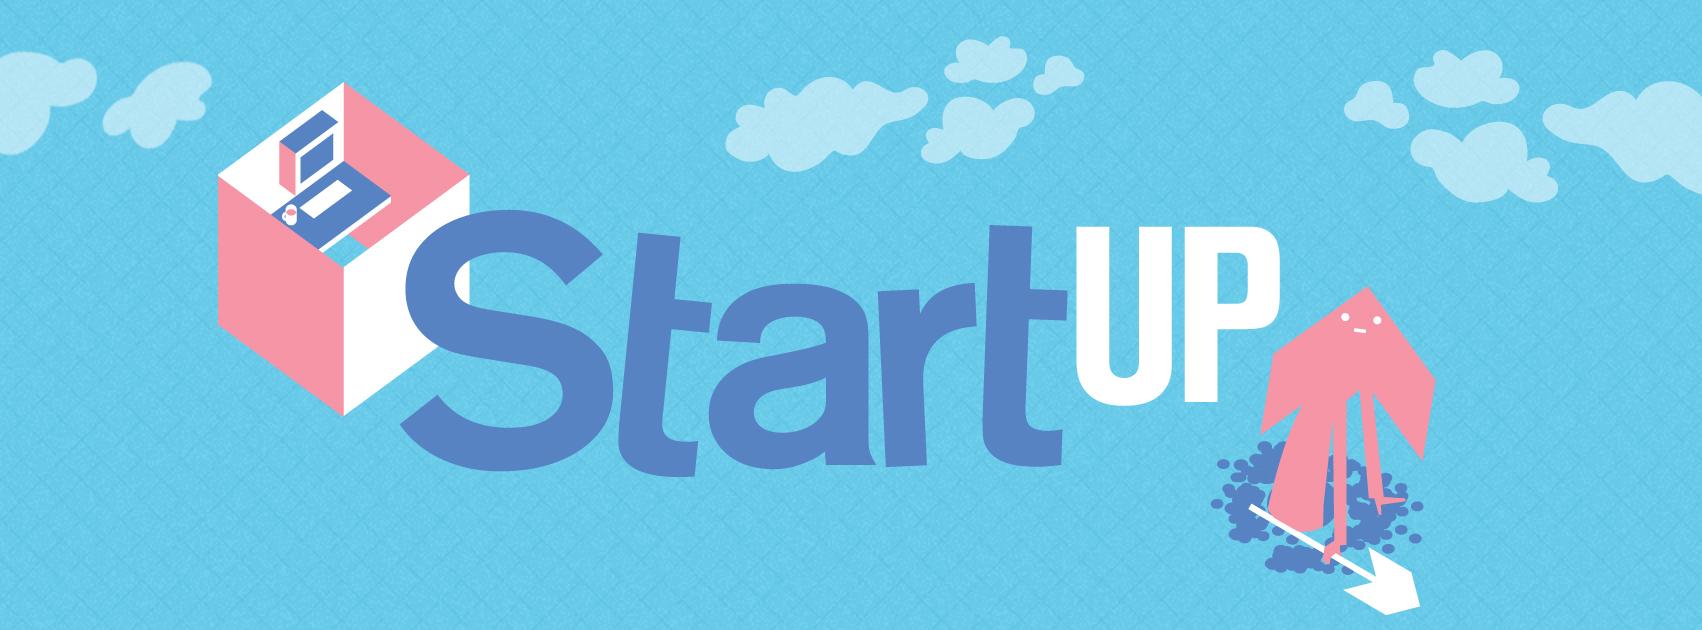 [Startup] Visa 생각/회사생활이 그립다.